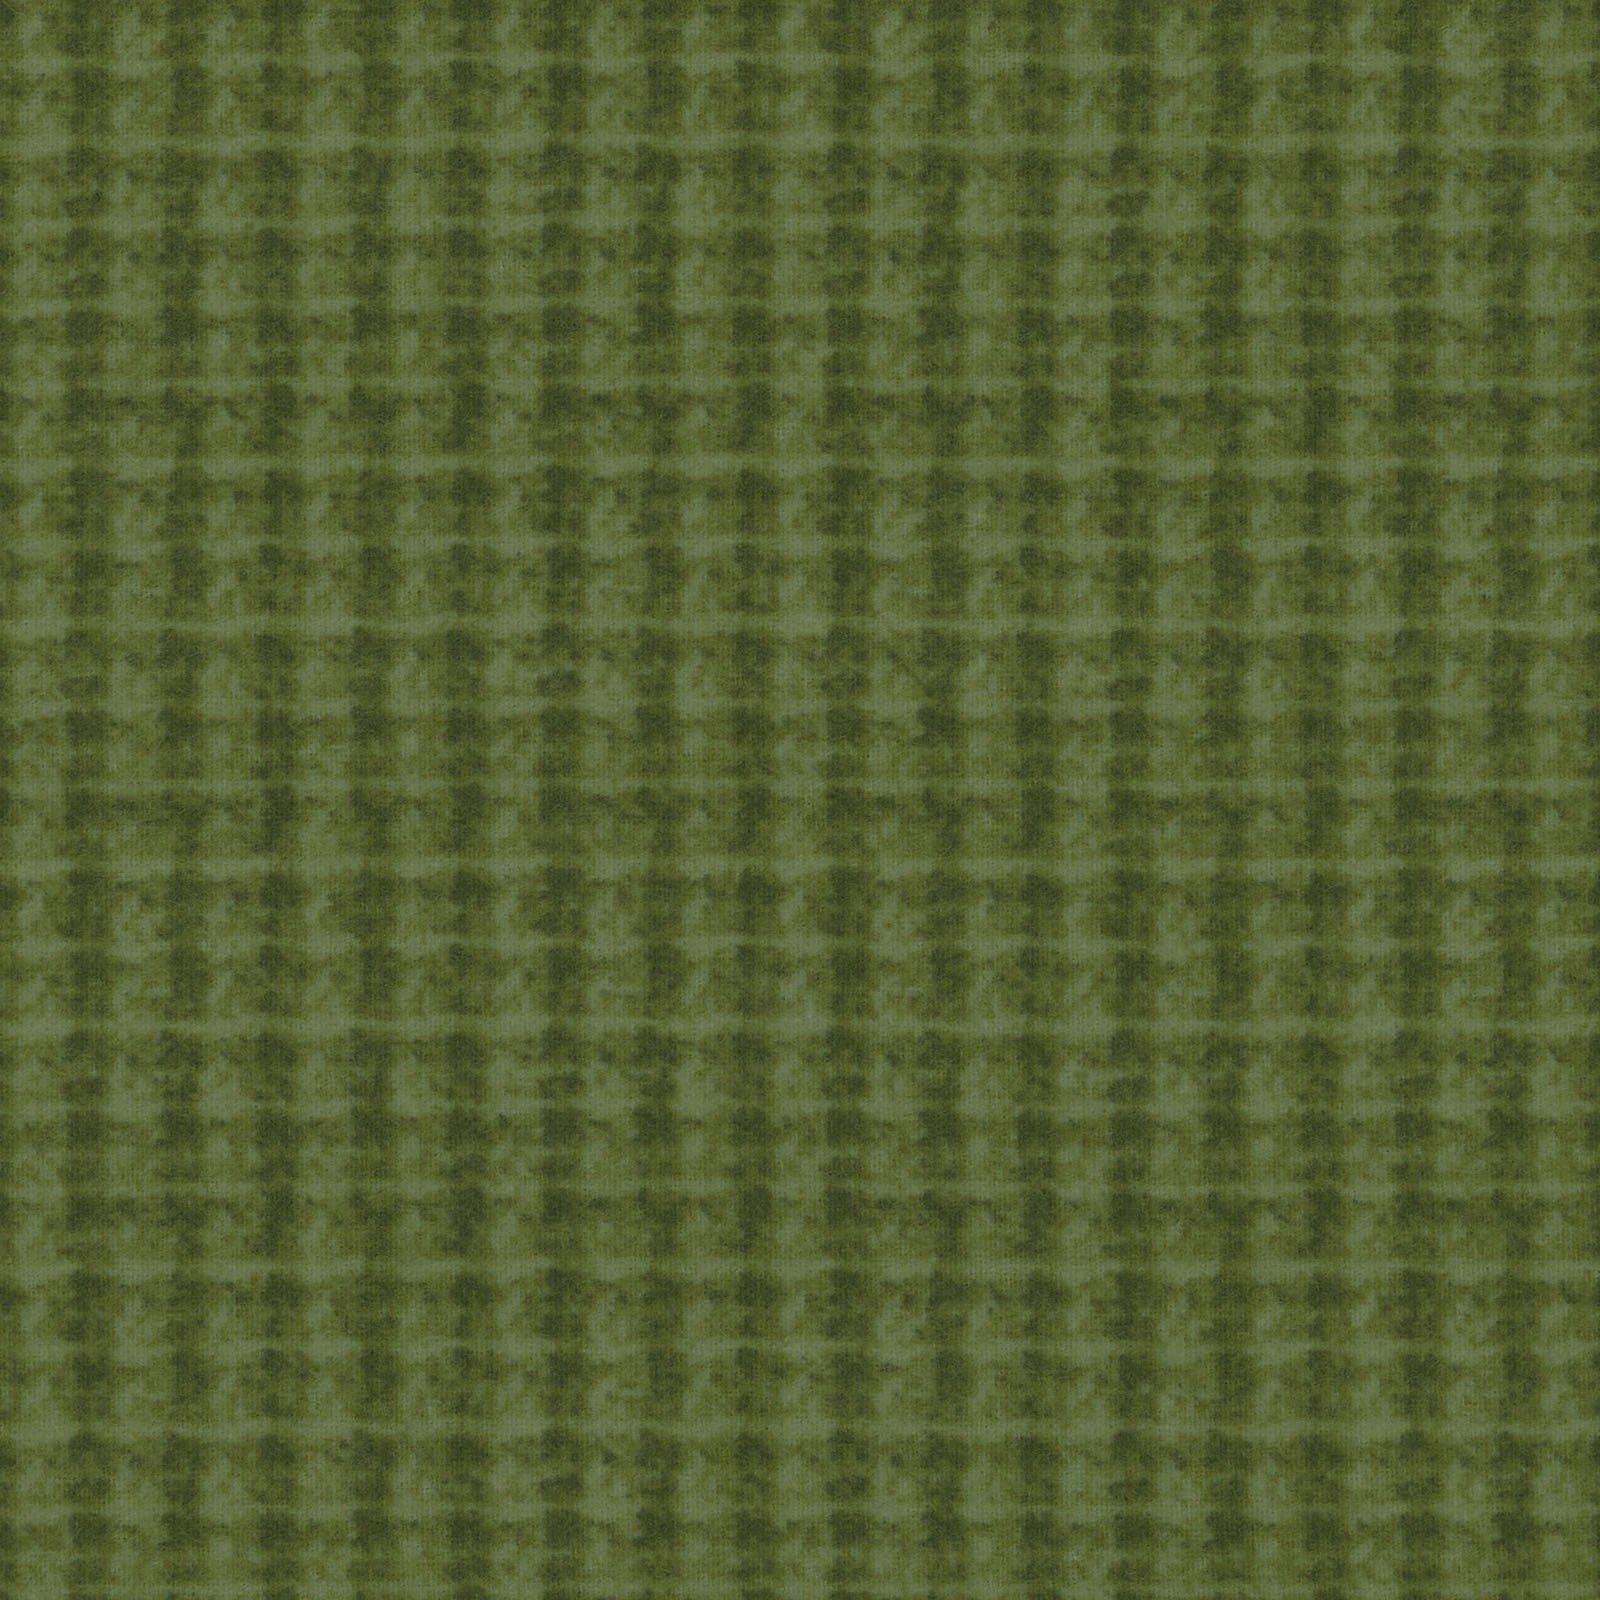 Woolies Flannel - Doubleweave - Light Green